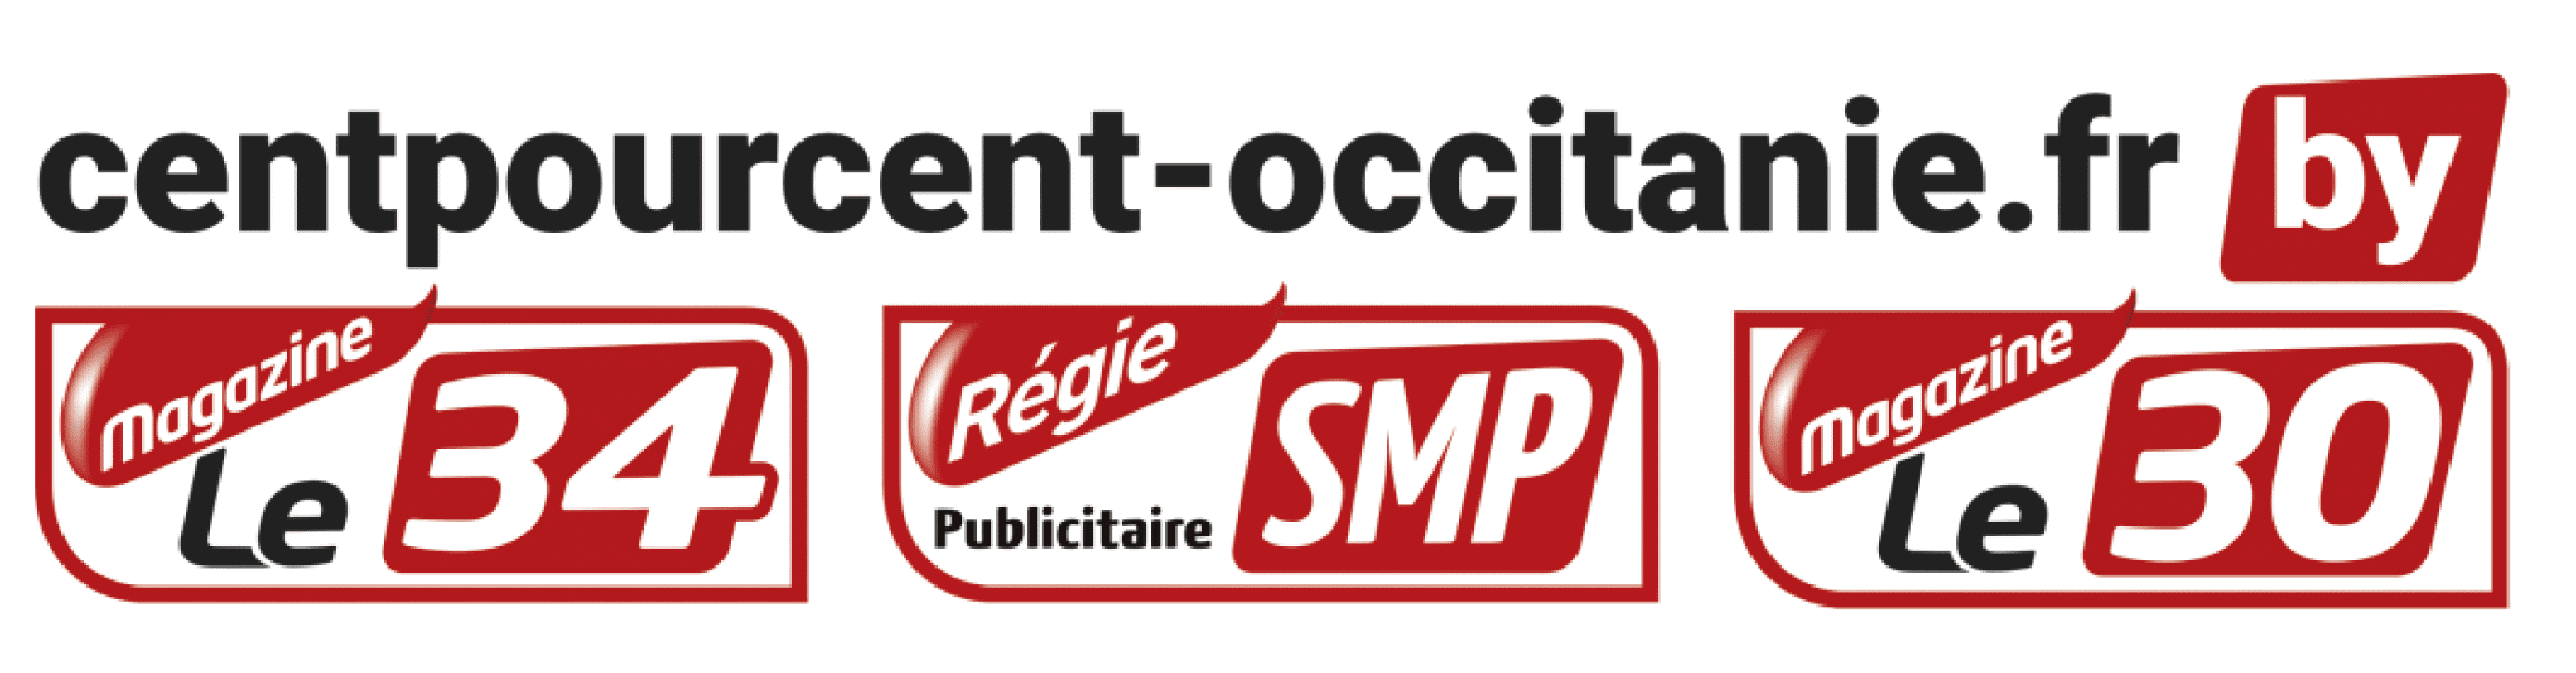 centpourcent-occitanie.fr